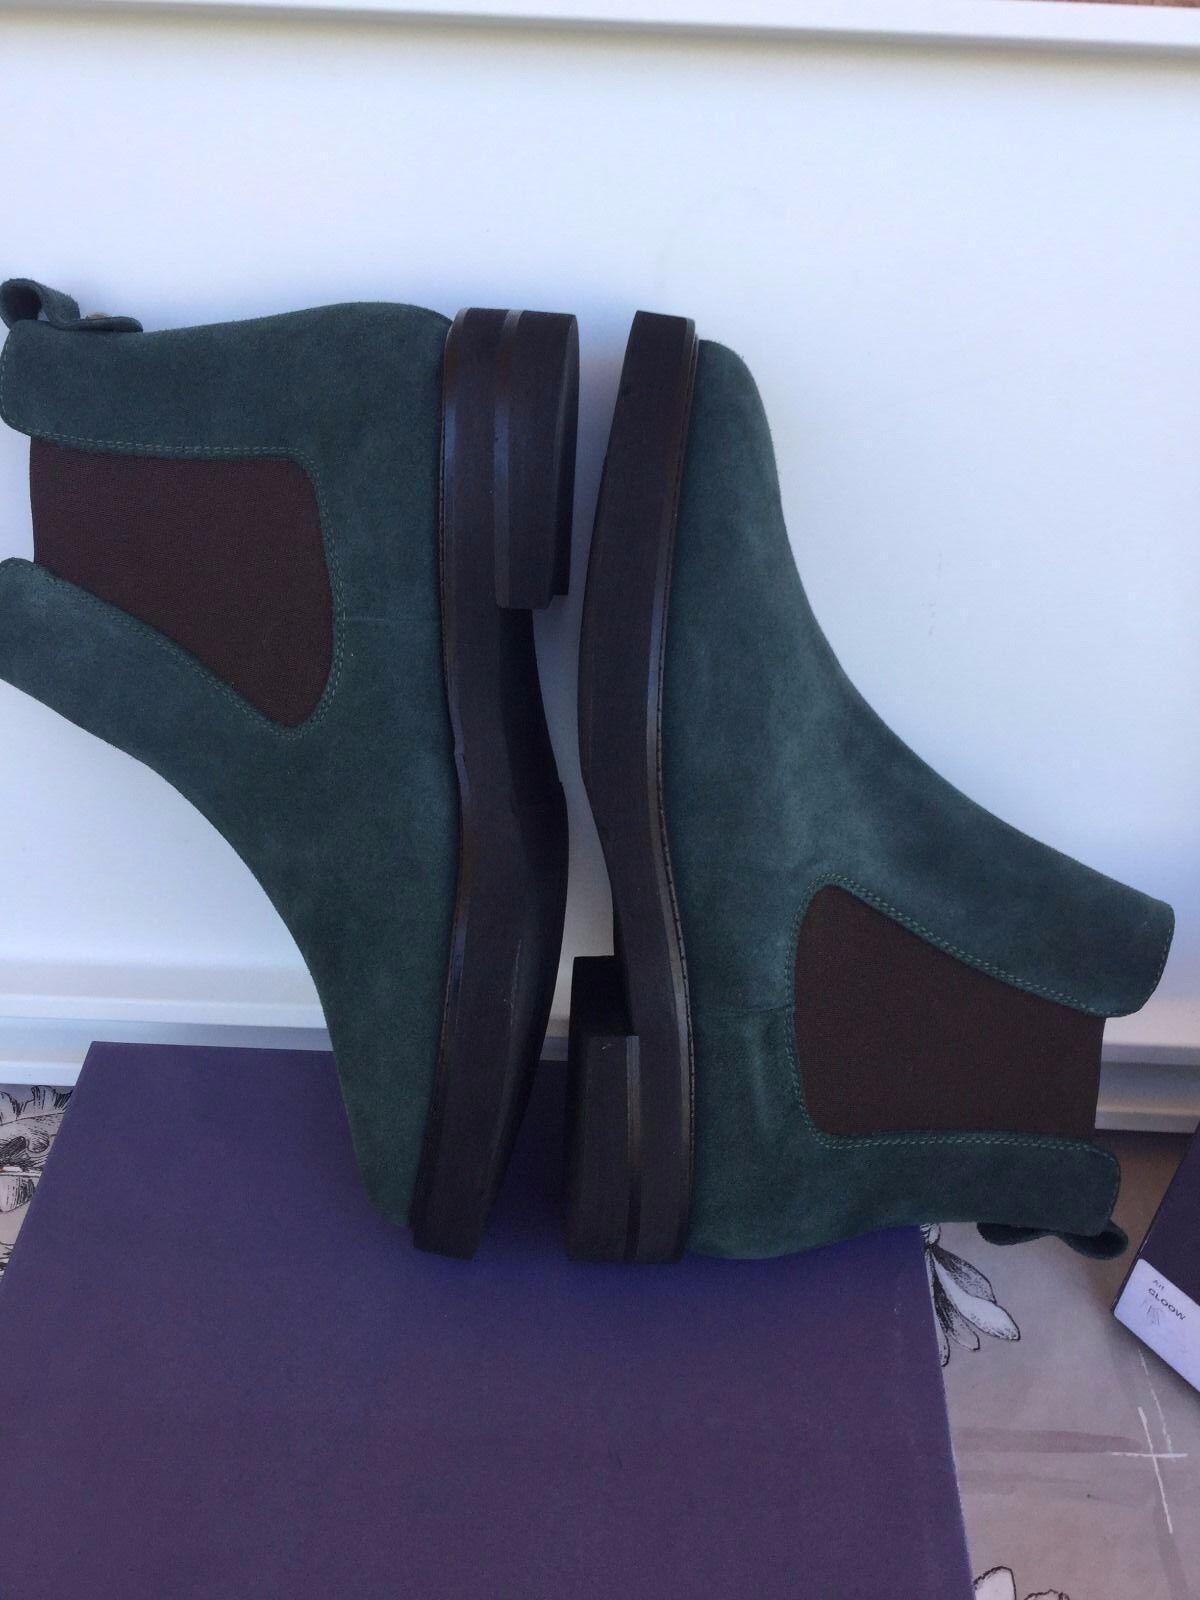 WALTER pine, púrpura  leather ankle botas  Woman Color pine, WALTER Talla 40 chamois Tronchetto 3e652b